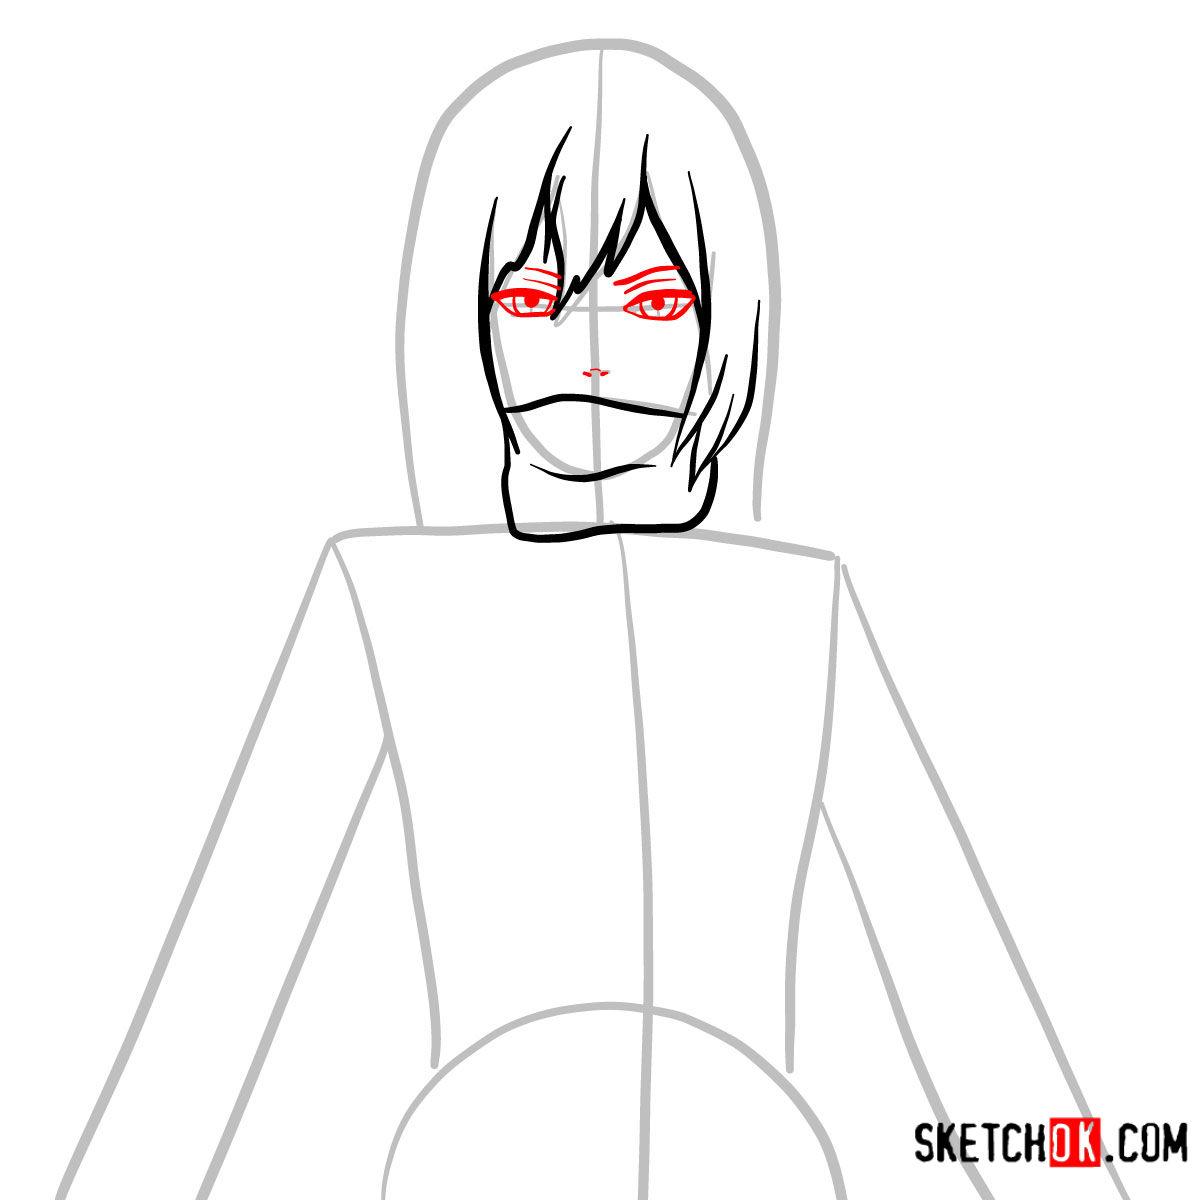 How to draw Mikasa Ackermann's face | Attack on Titan - step 04